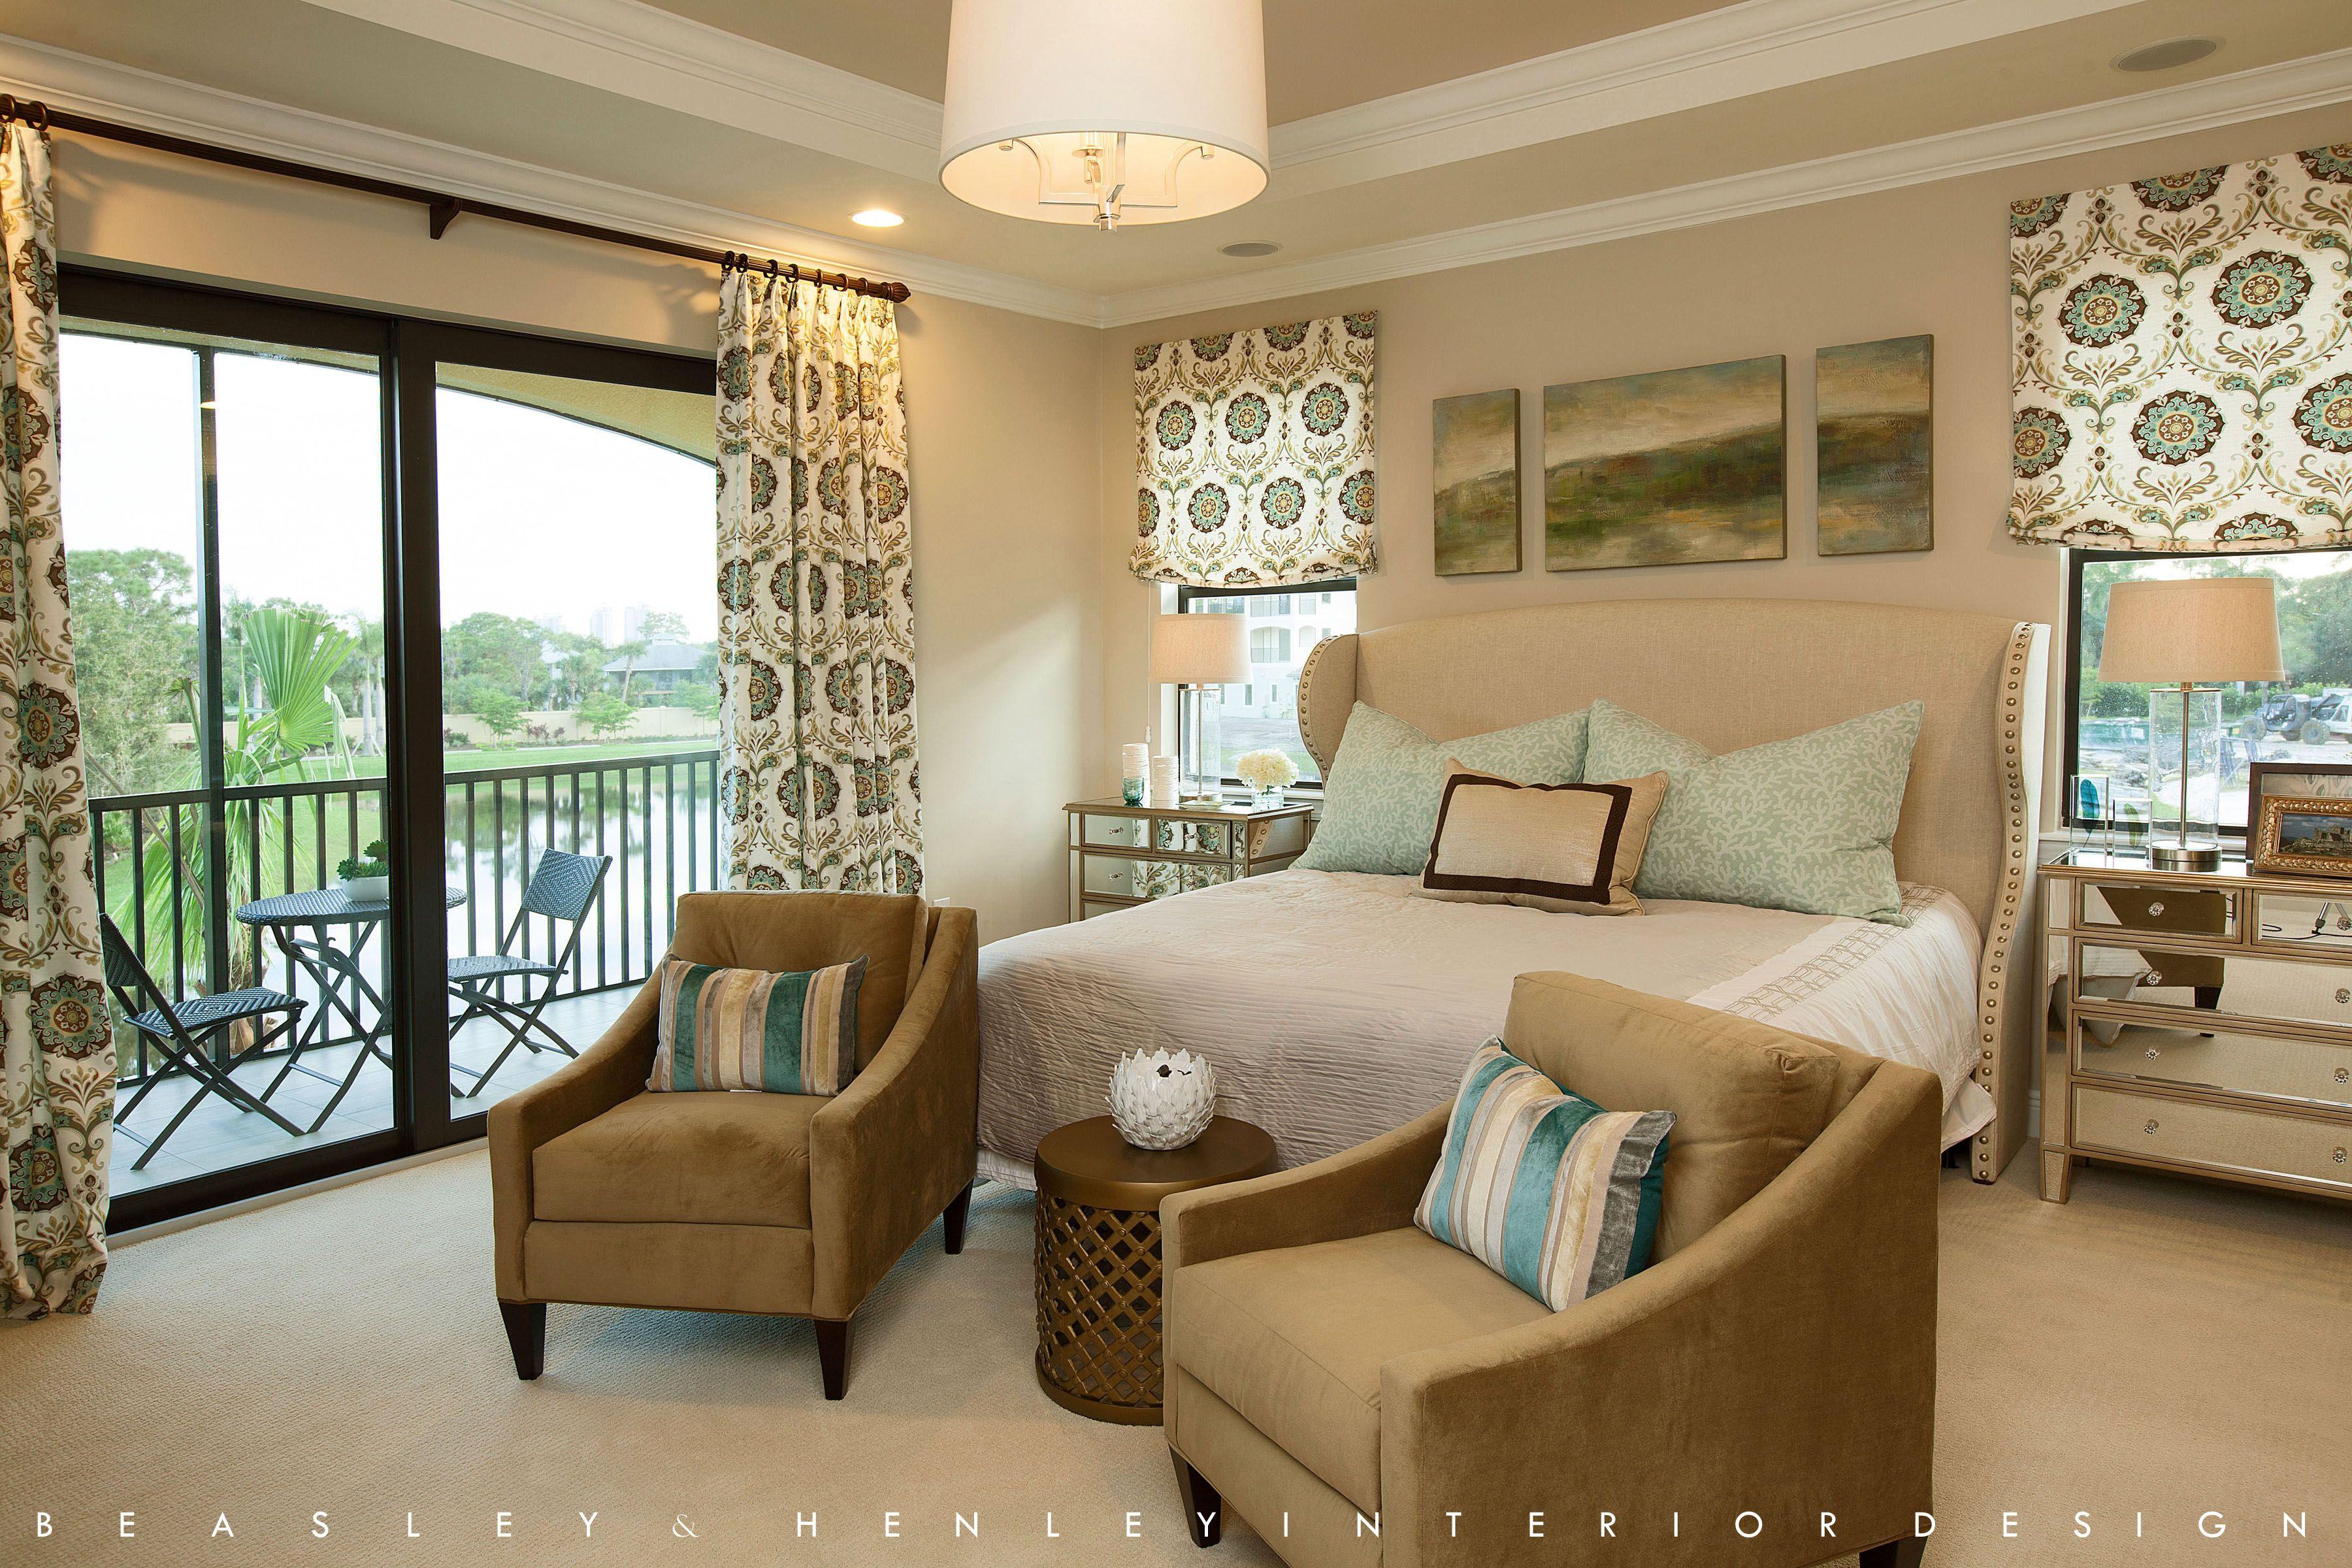 Beasley Henley Bedrooms Designs On Pinterest 64 Pins